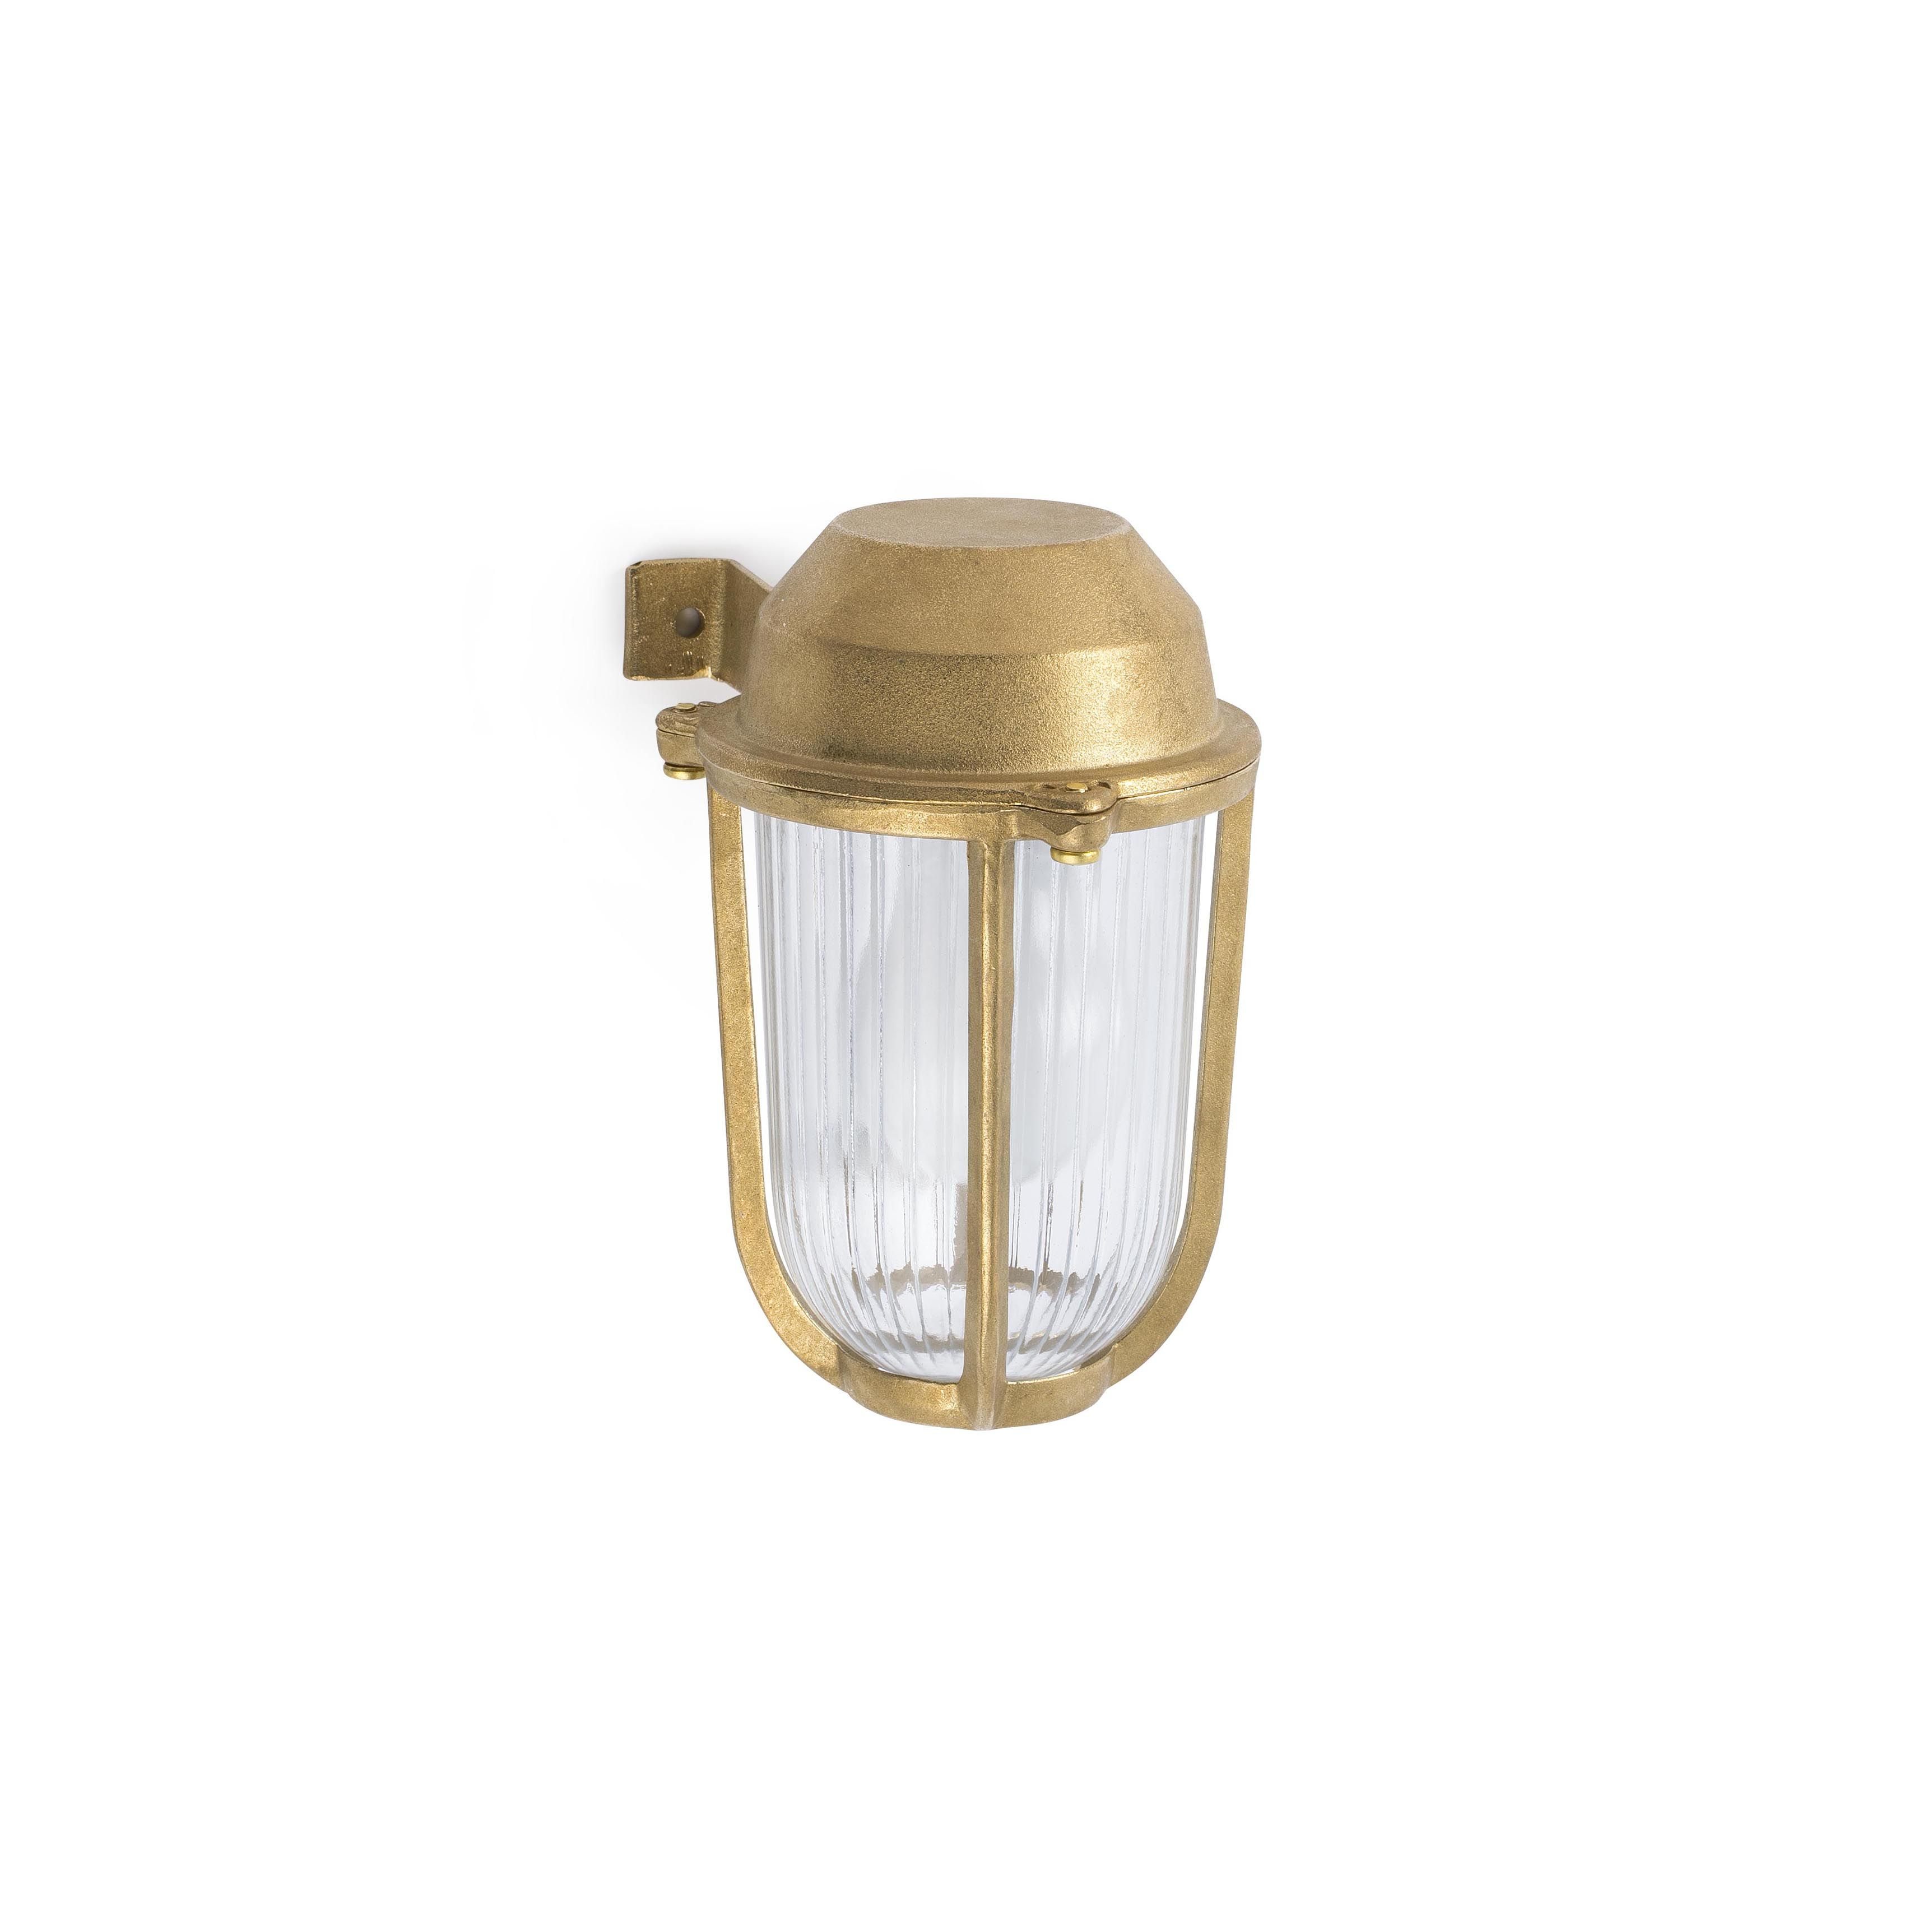 da2a0975bf3f867c8d0833092d0c1288 Wunderbar Led Lampen E14 Warmweiß Dekorationen